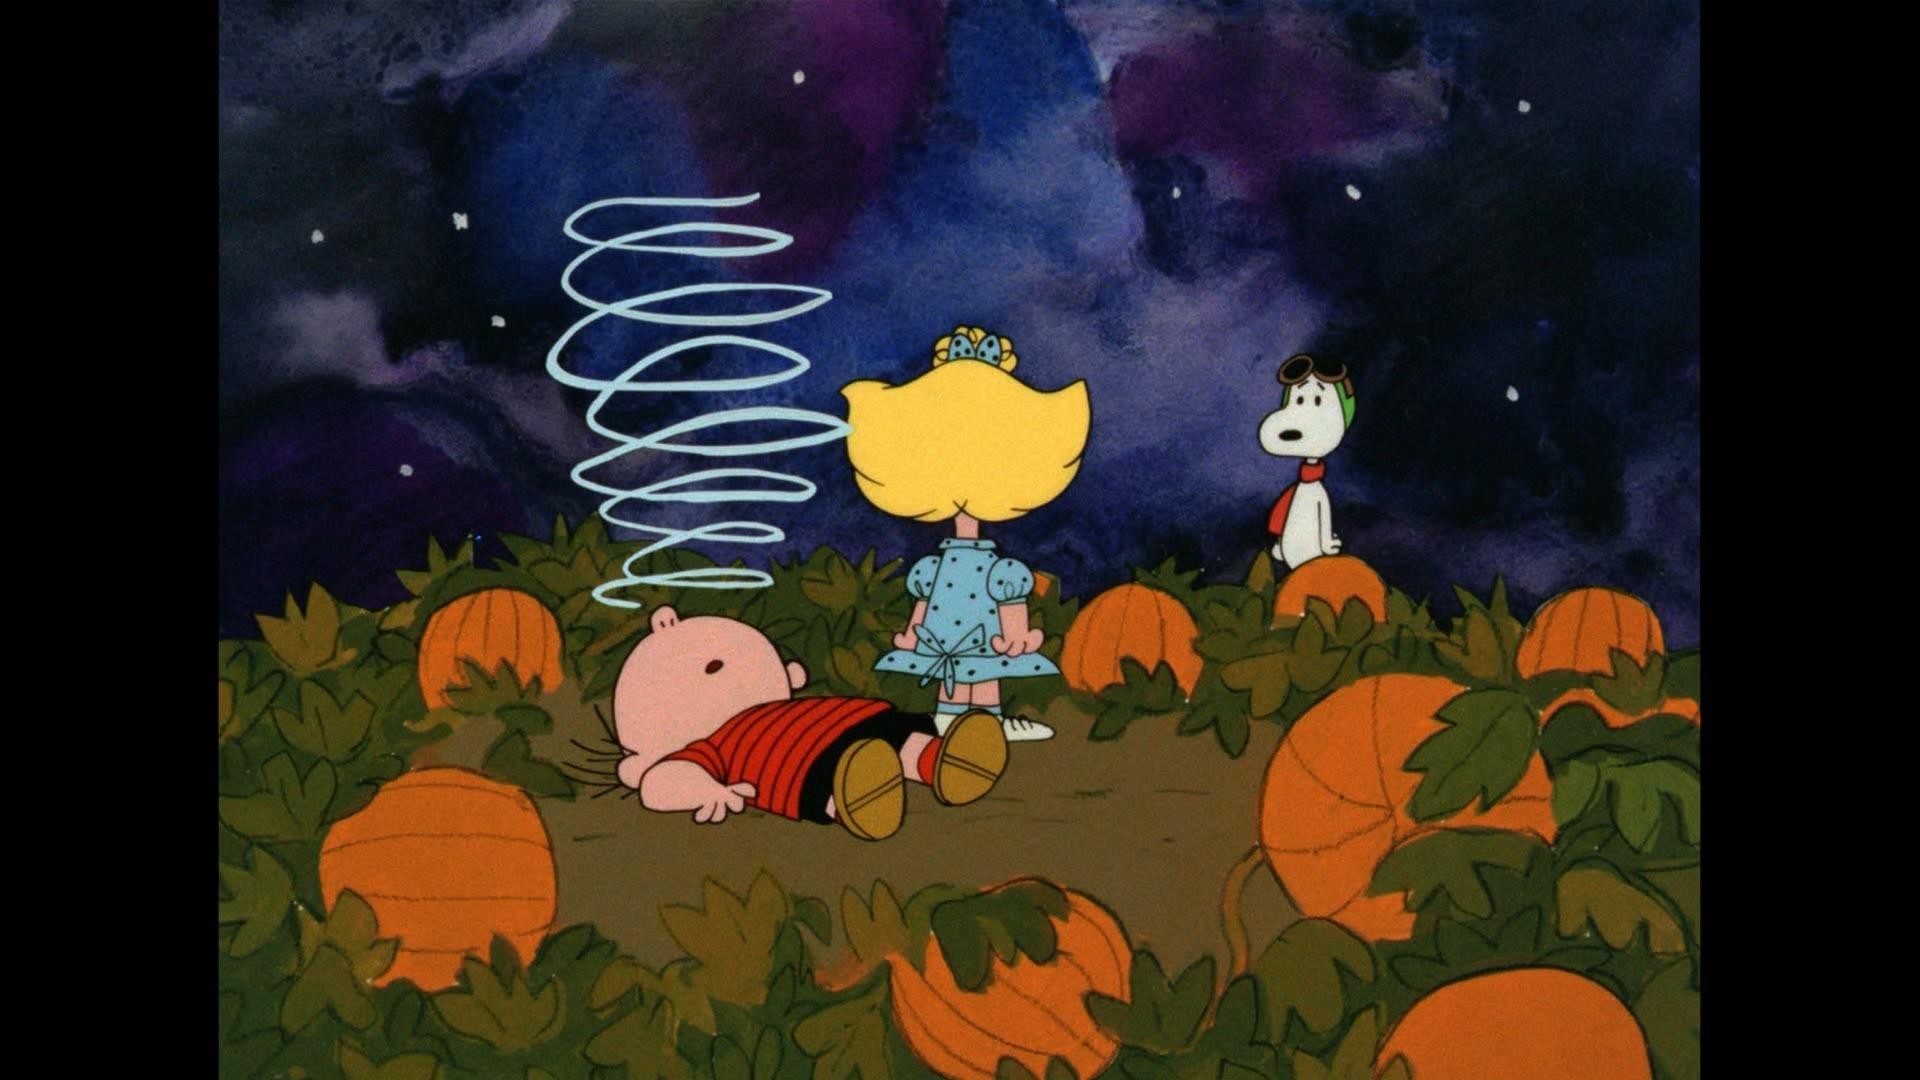 10 Latest Peanuts Halloween Desktop Wallpaper FULL HD 1920 ...